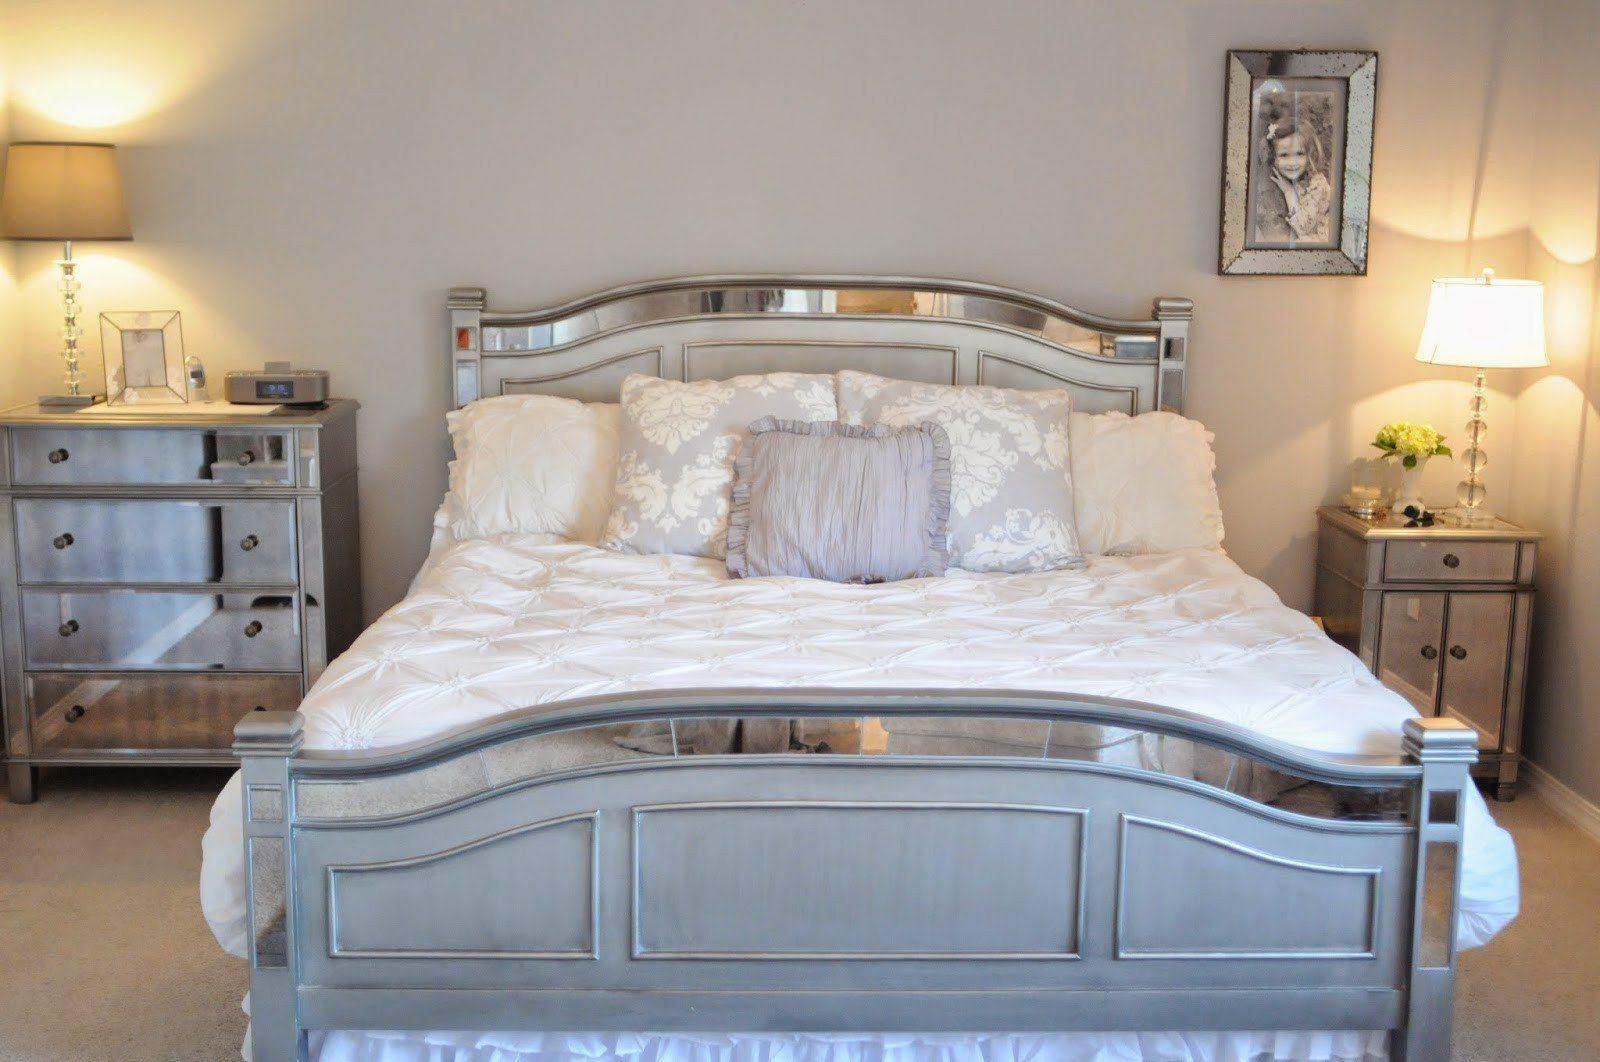 Pier One Bedroom Set Antiques & Estate Sale Items Bedroom Set